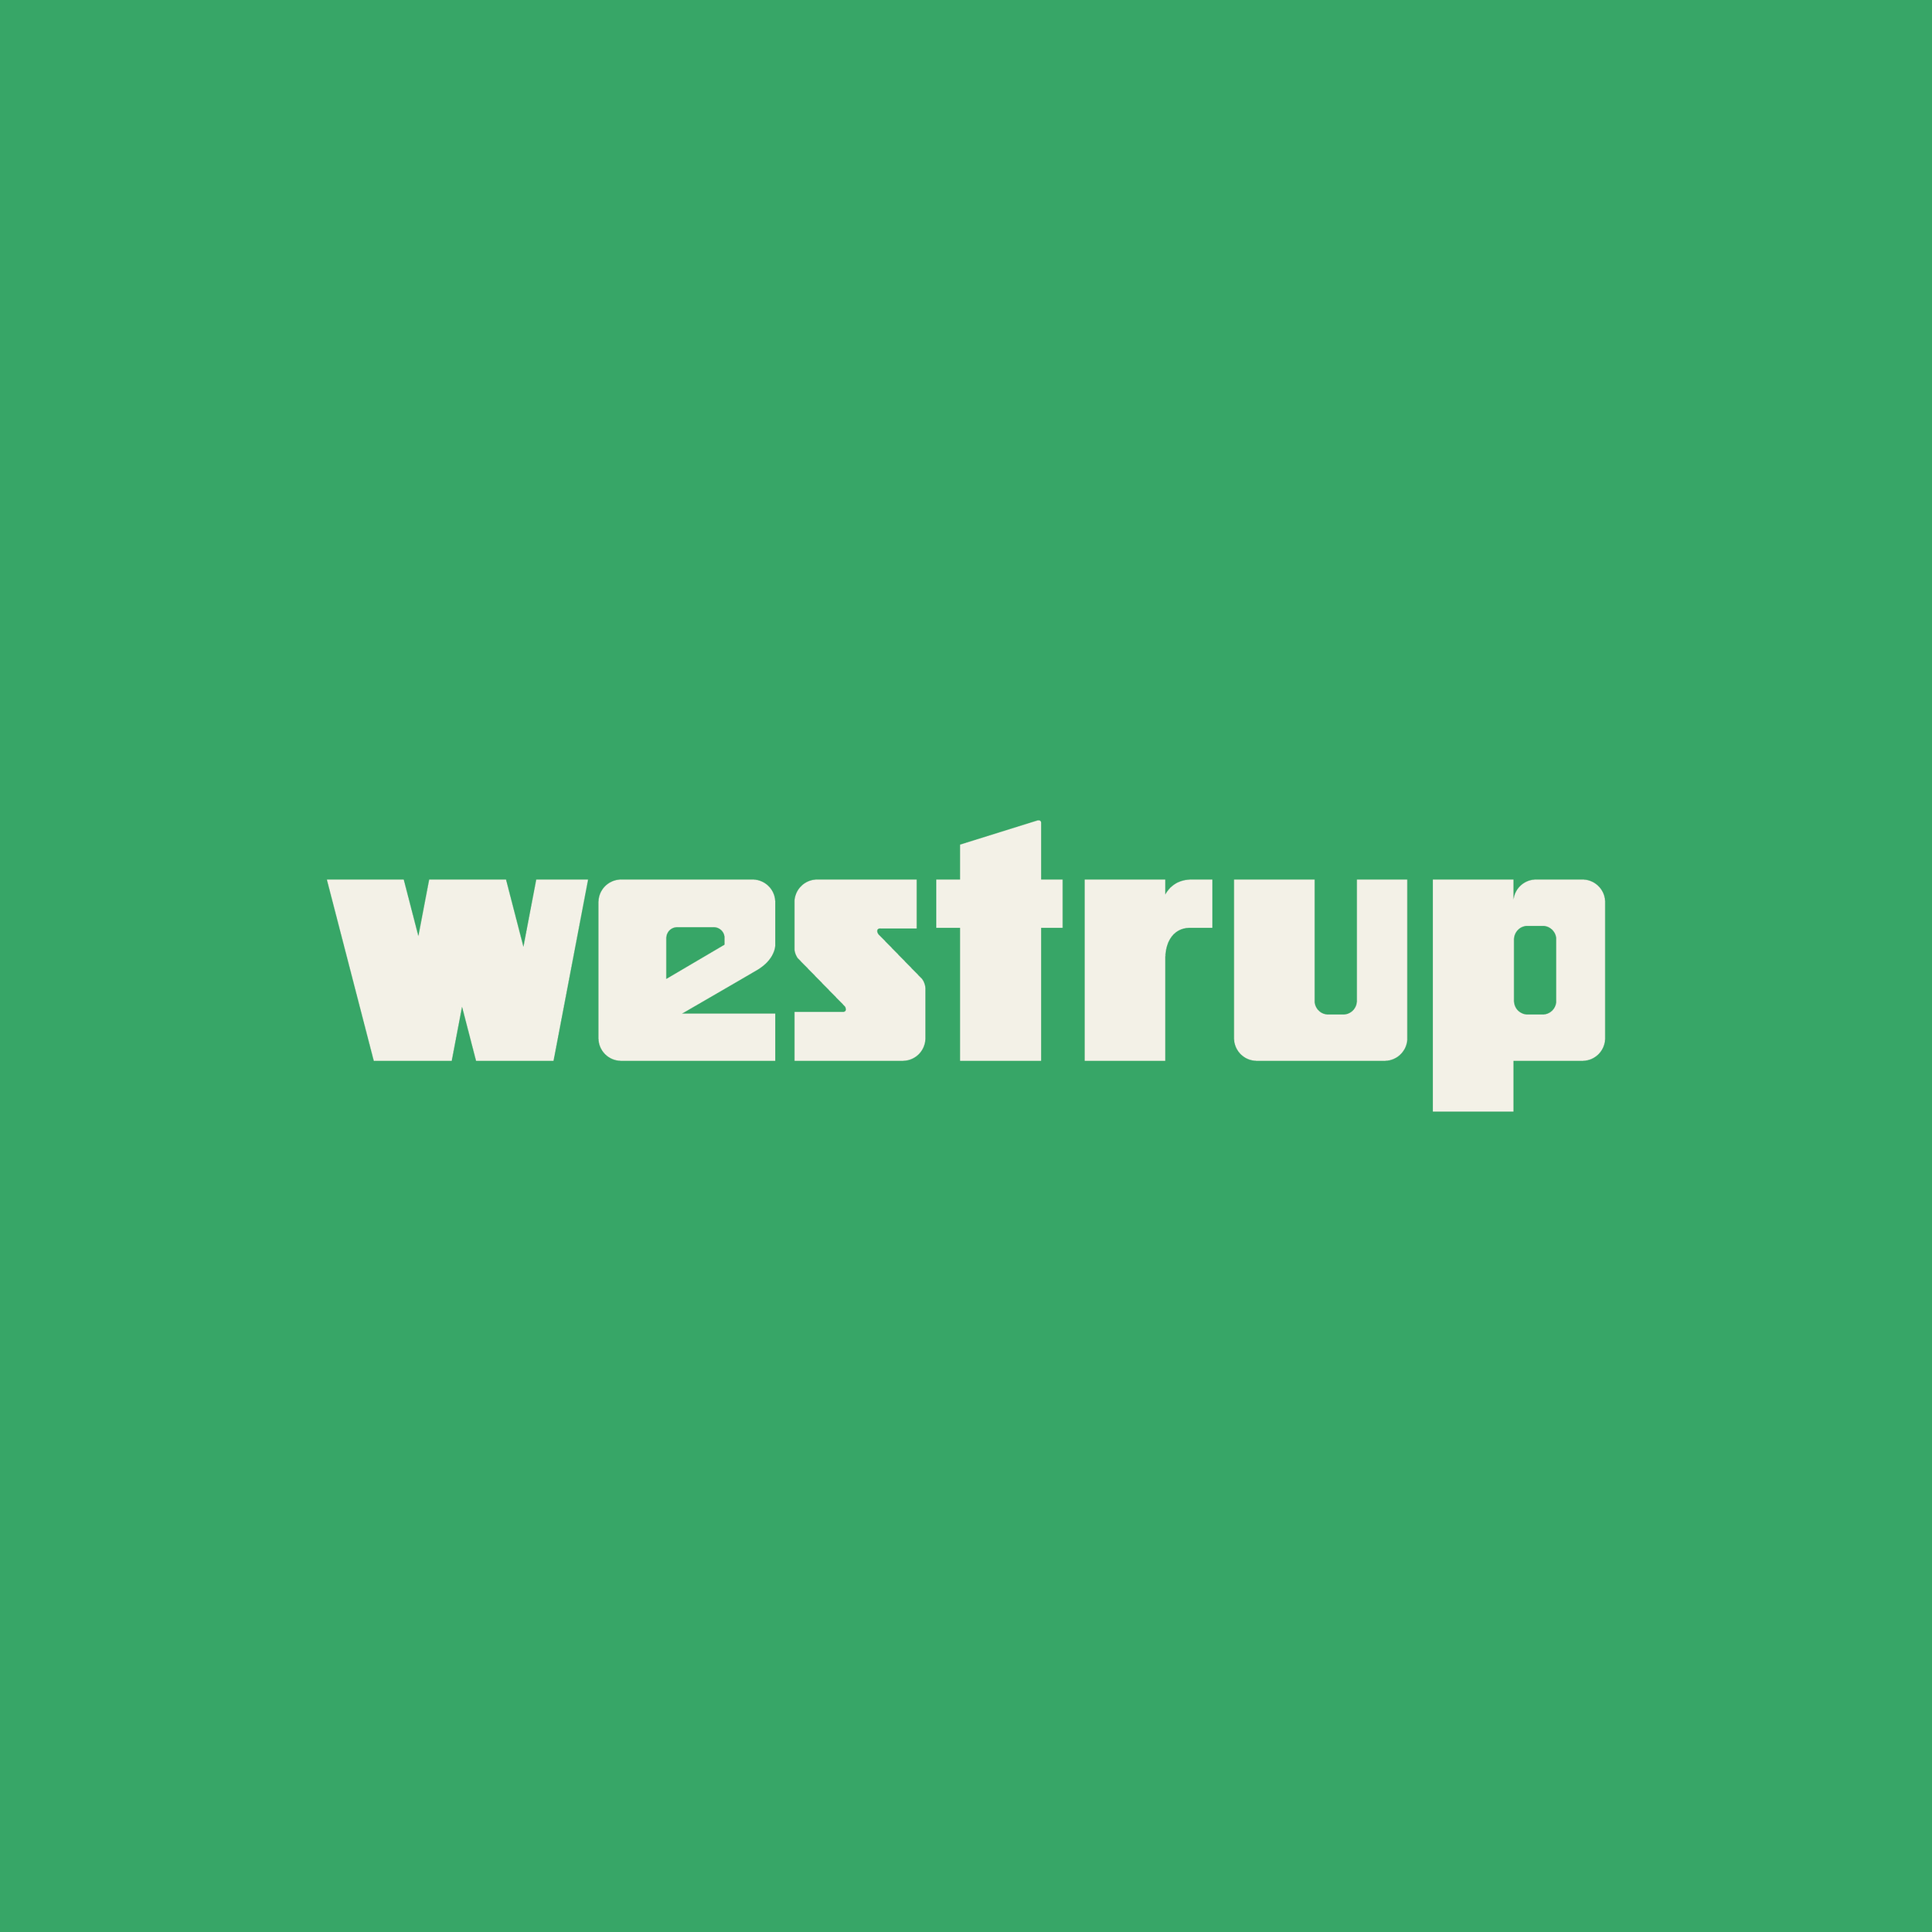 Westrup_logo_green_white_2.png